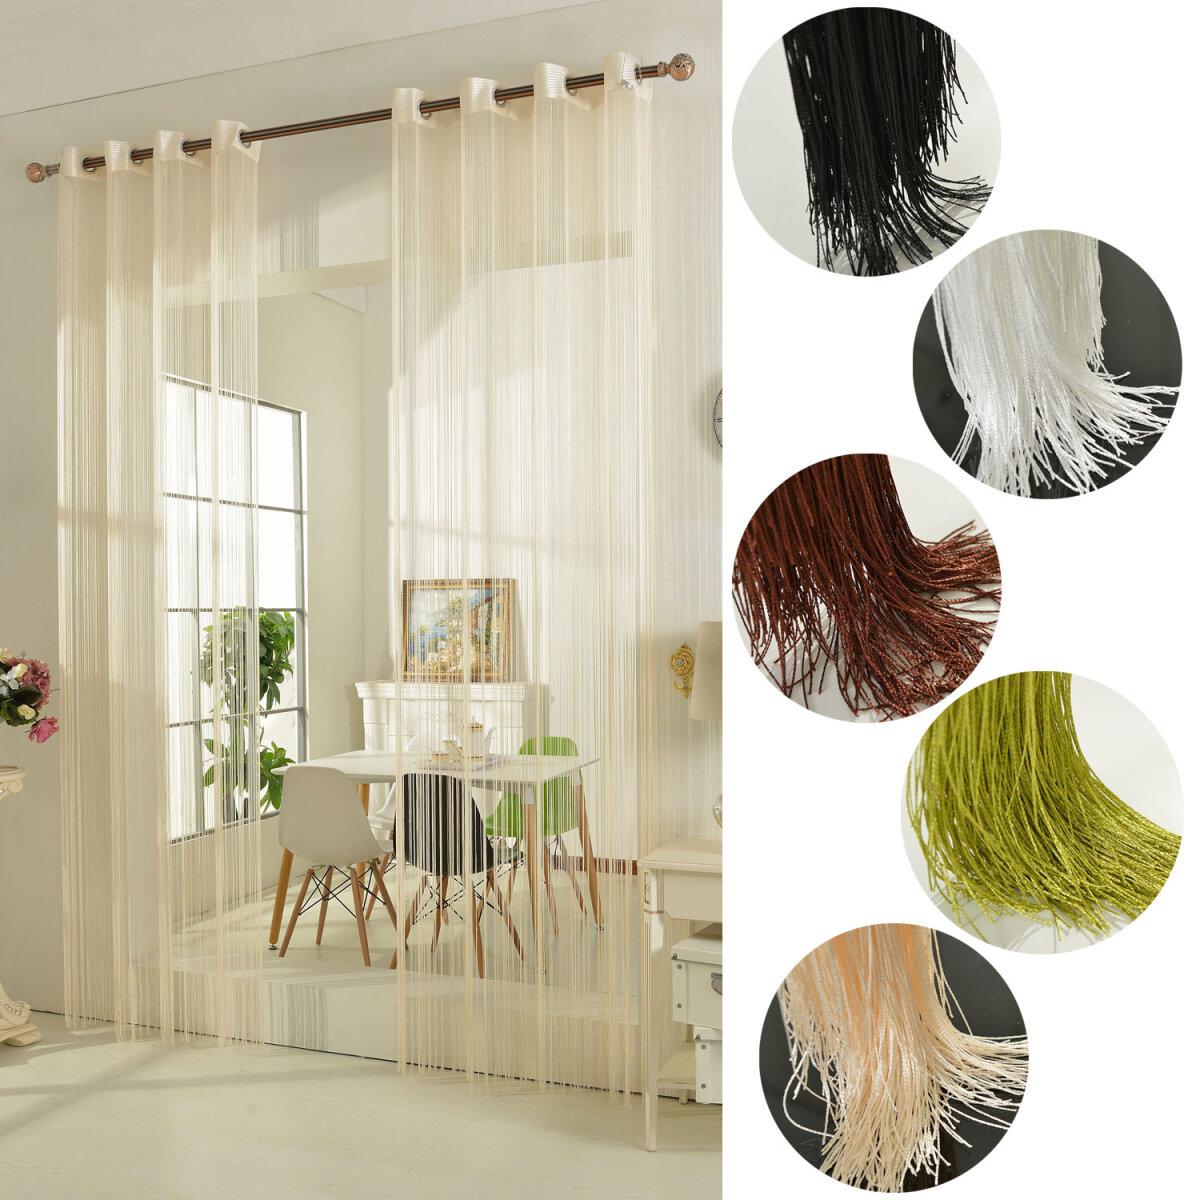 Raumteiler Vorhang Befestigung vorhang als raumteiler